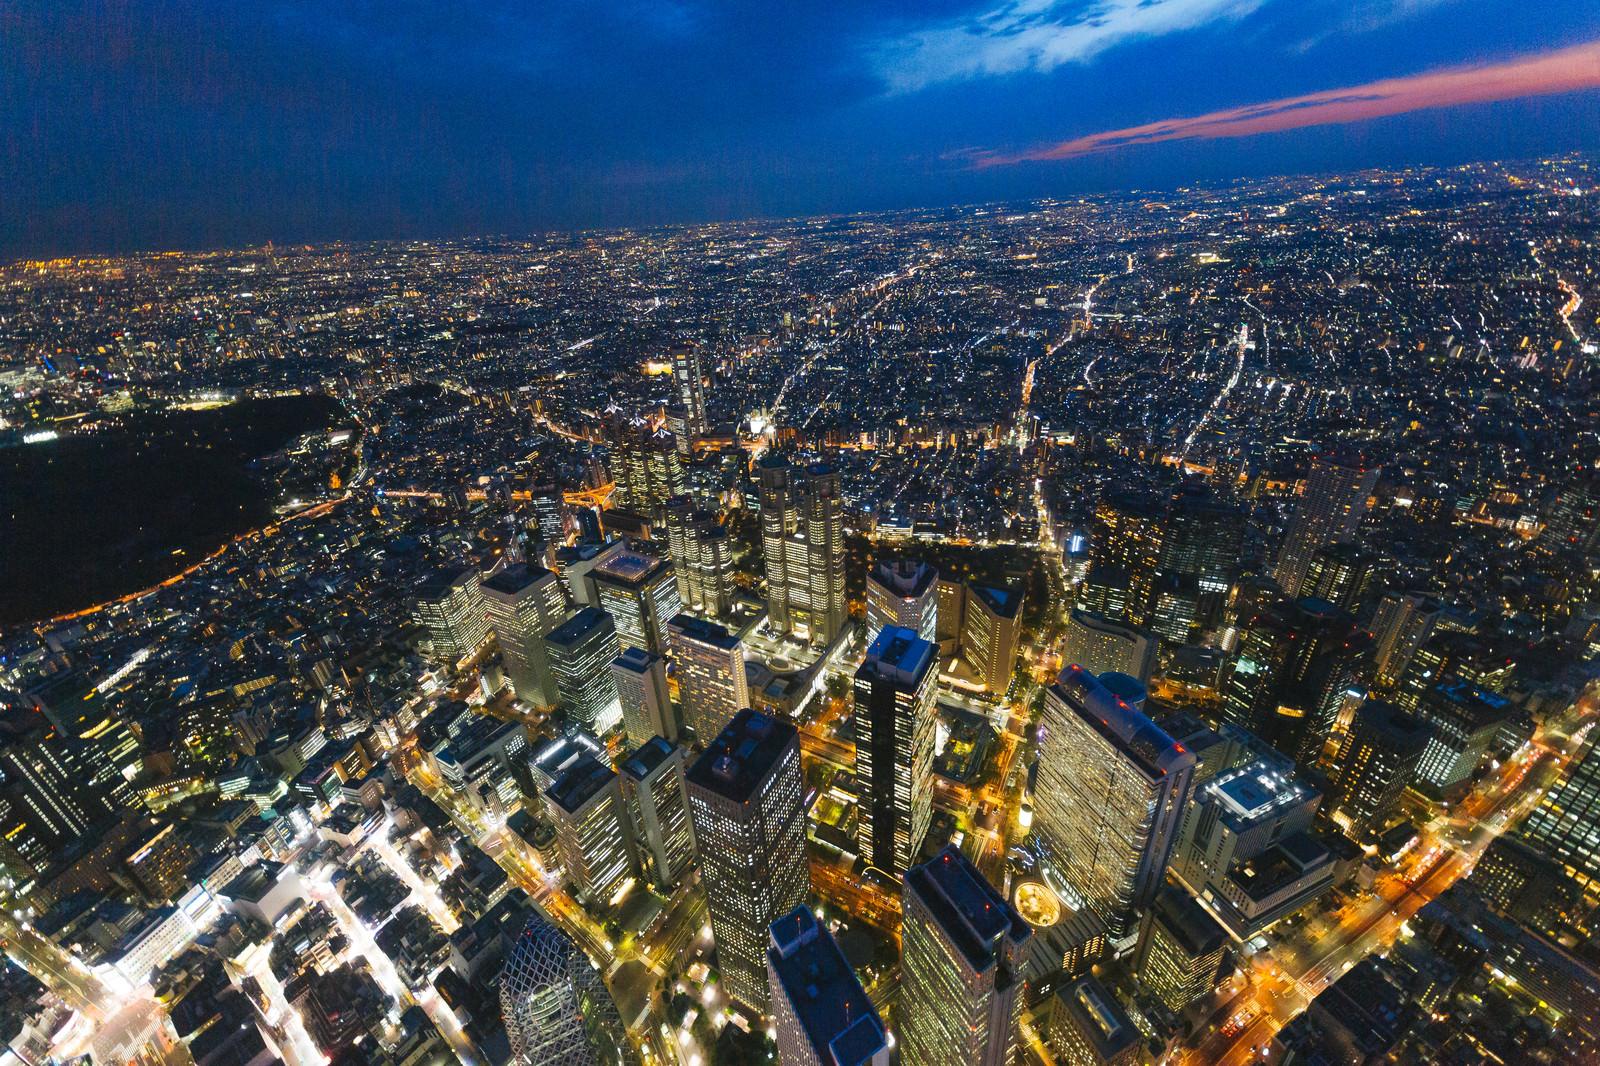 「新宿都庁上空の夜景」の写真